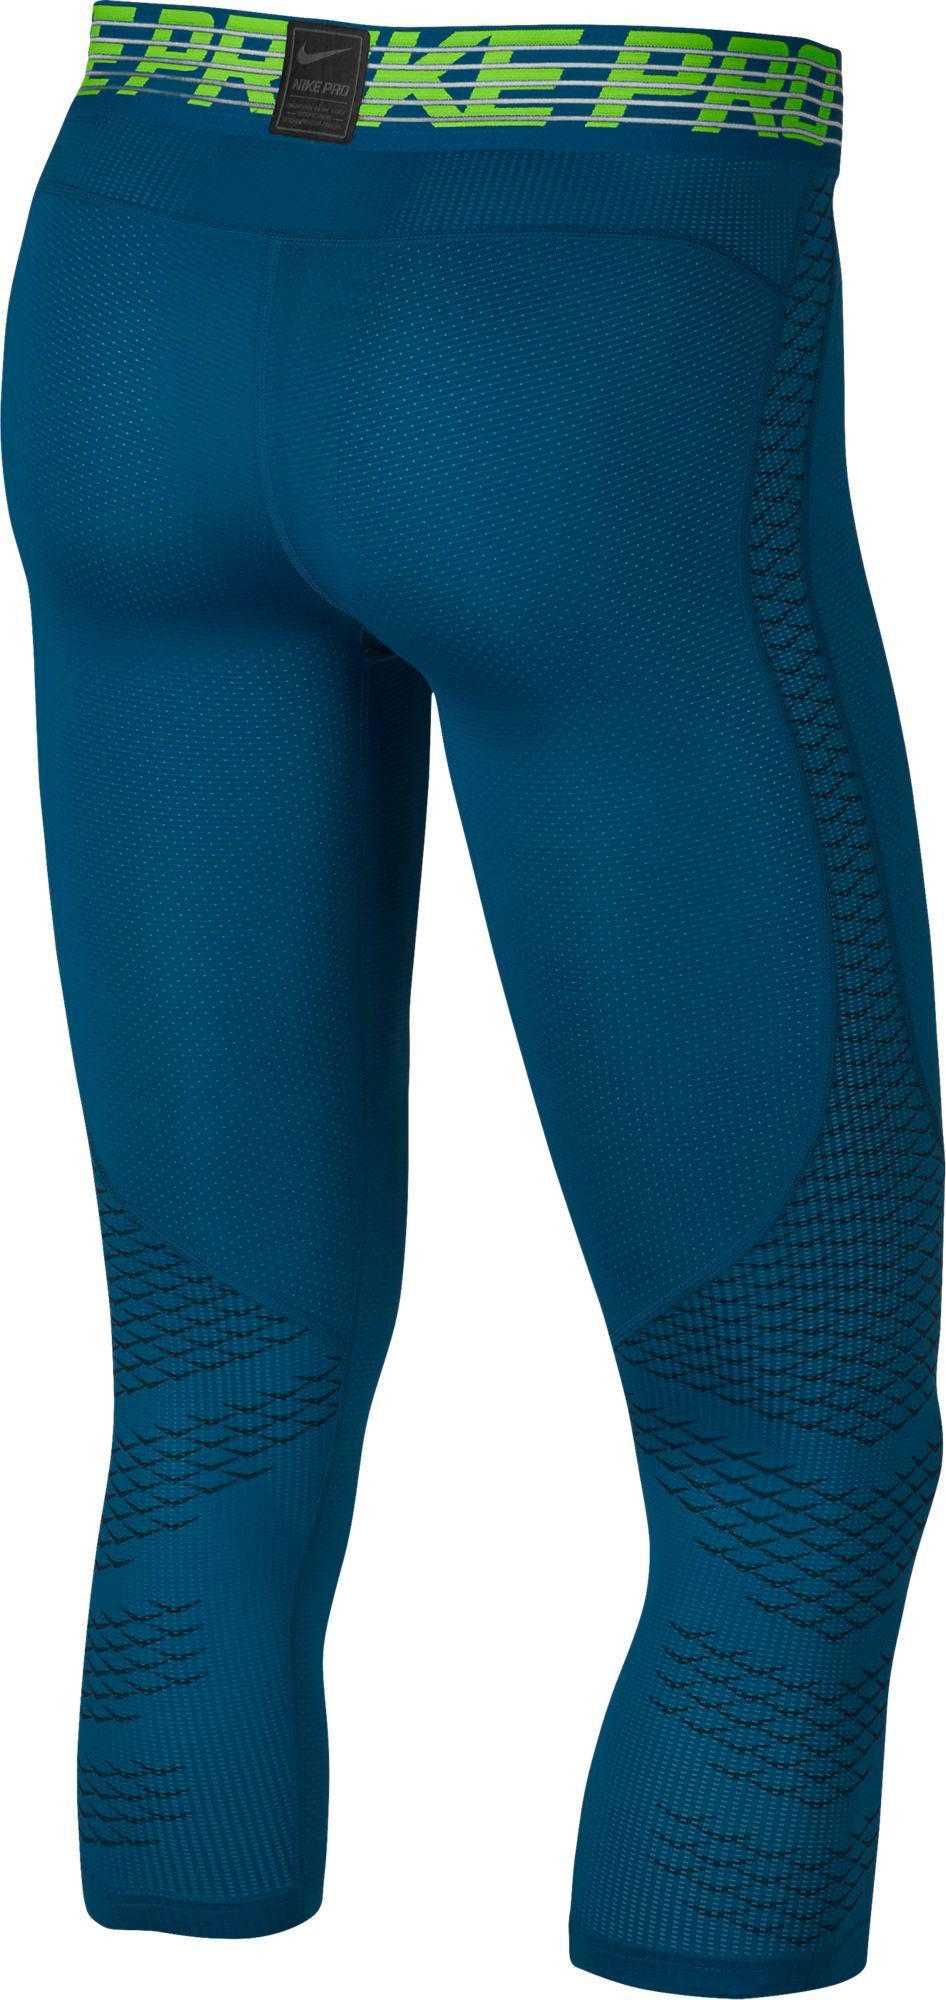 Nike Pro Men's 34 Length Tights